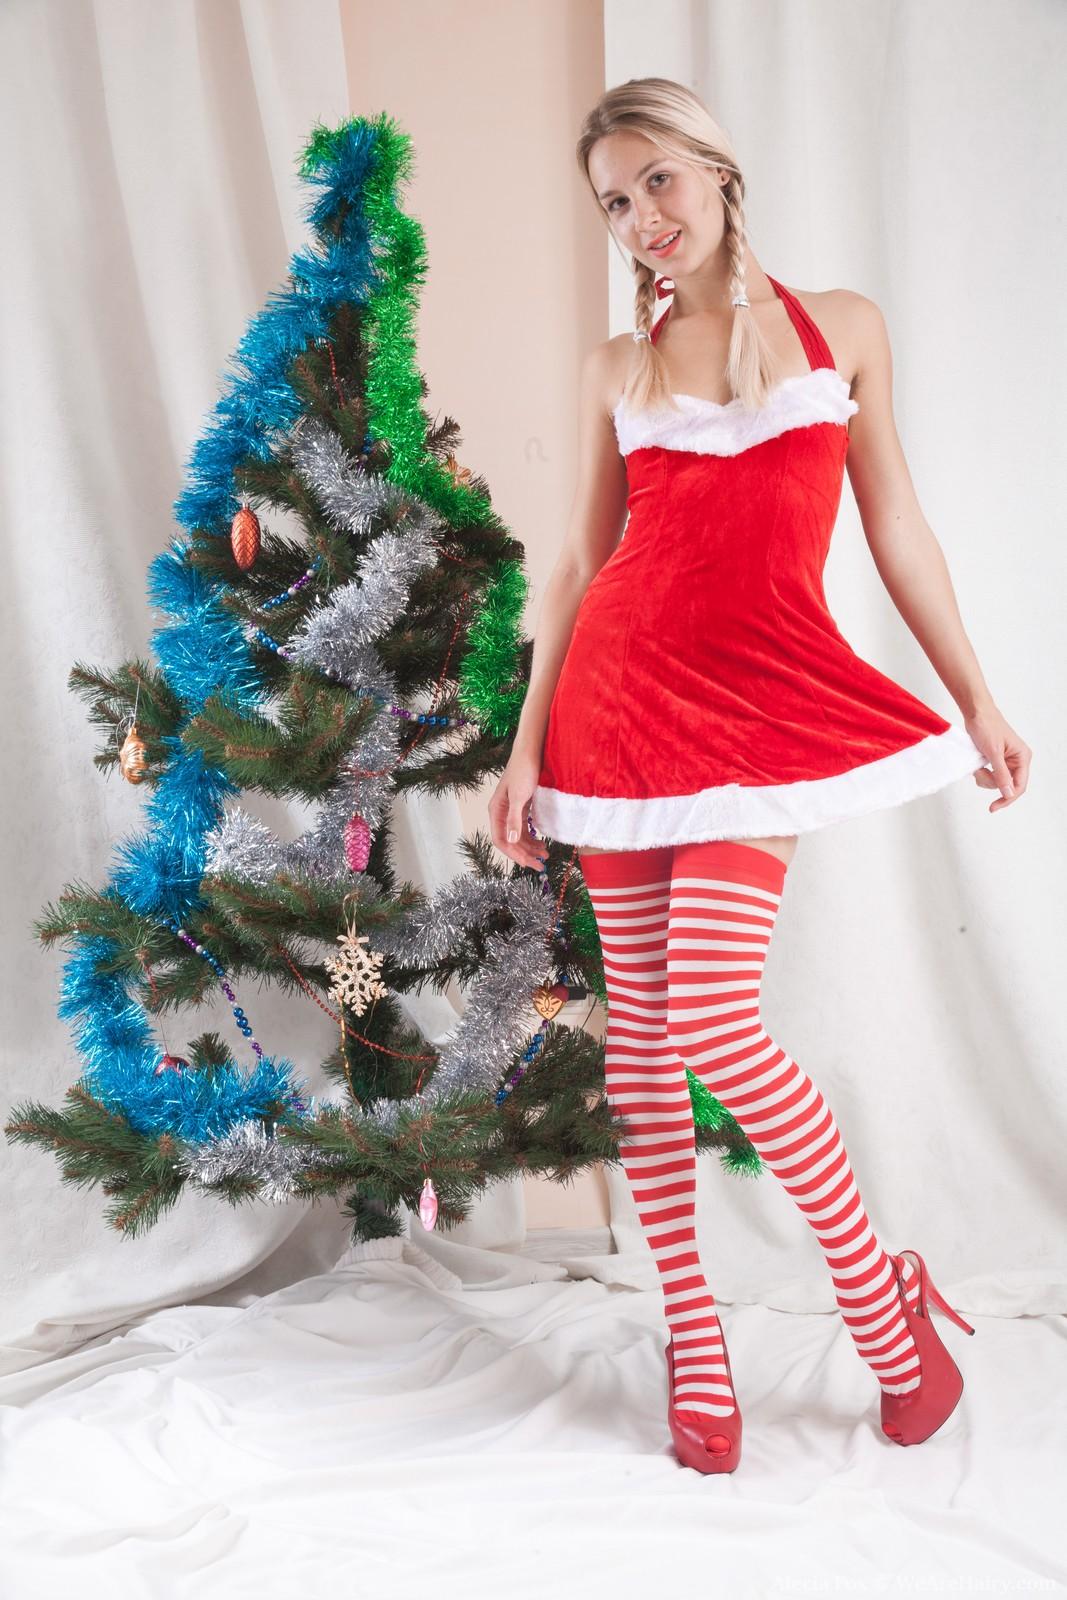 Alecia Fox celebrates Christmas